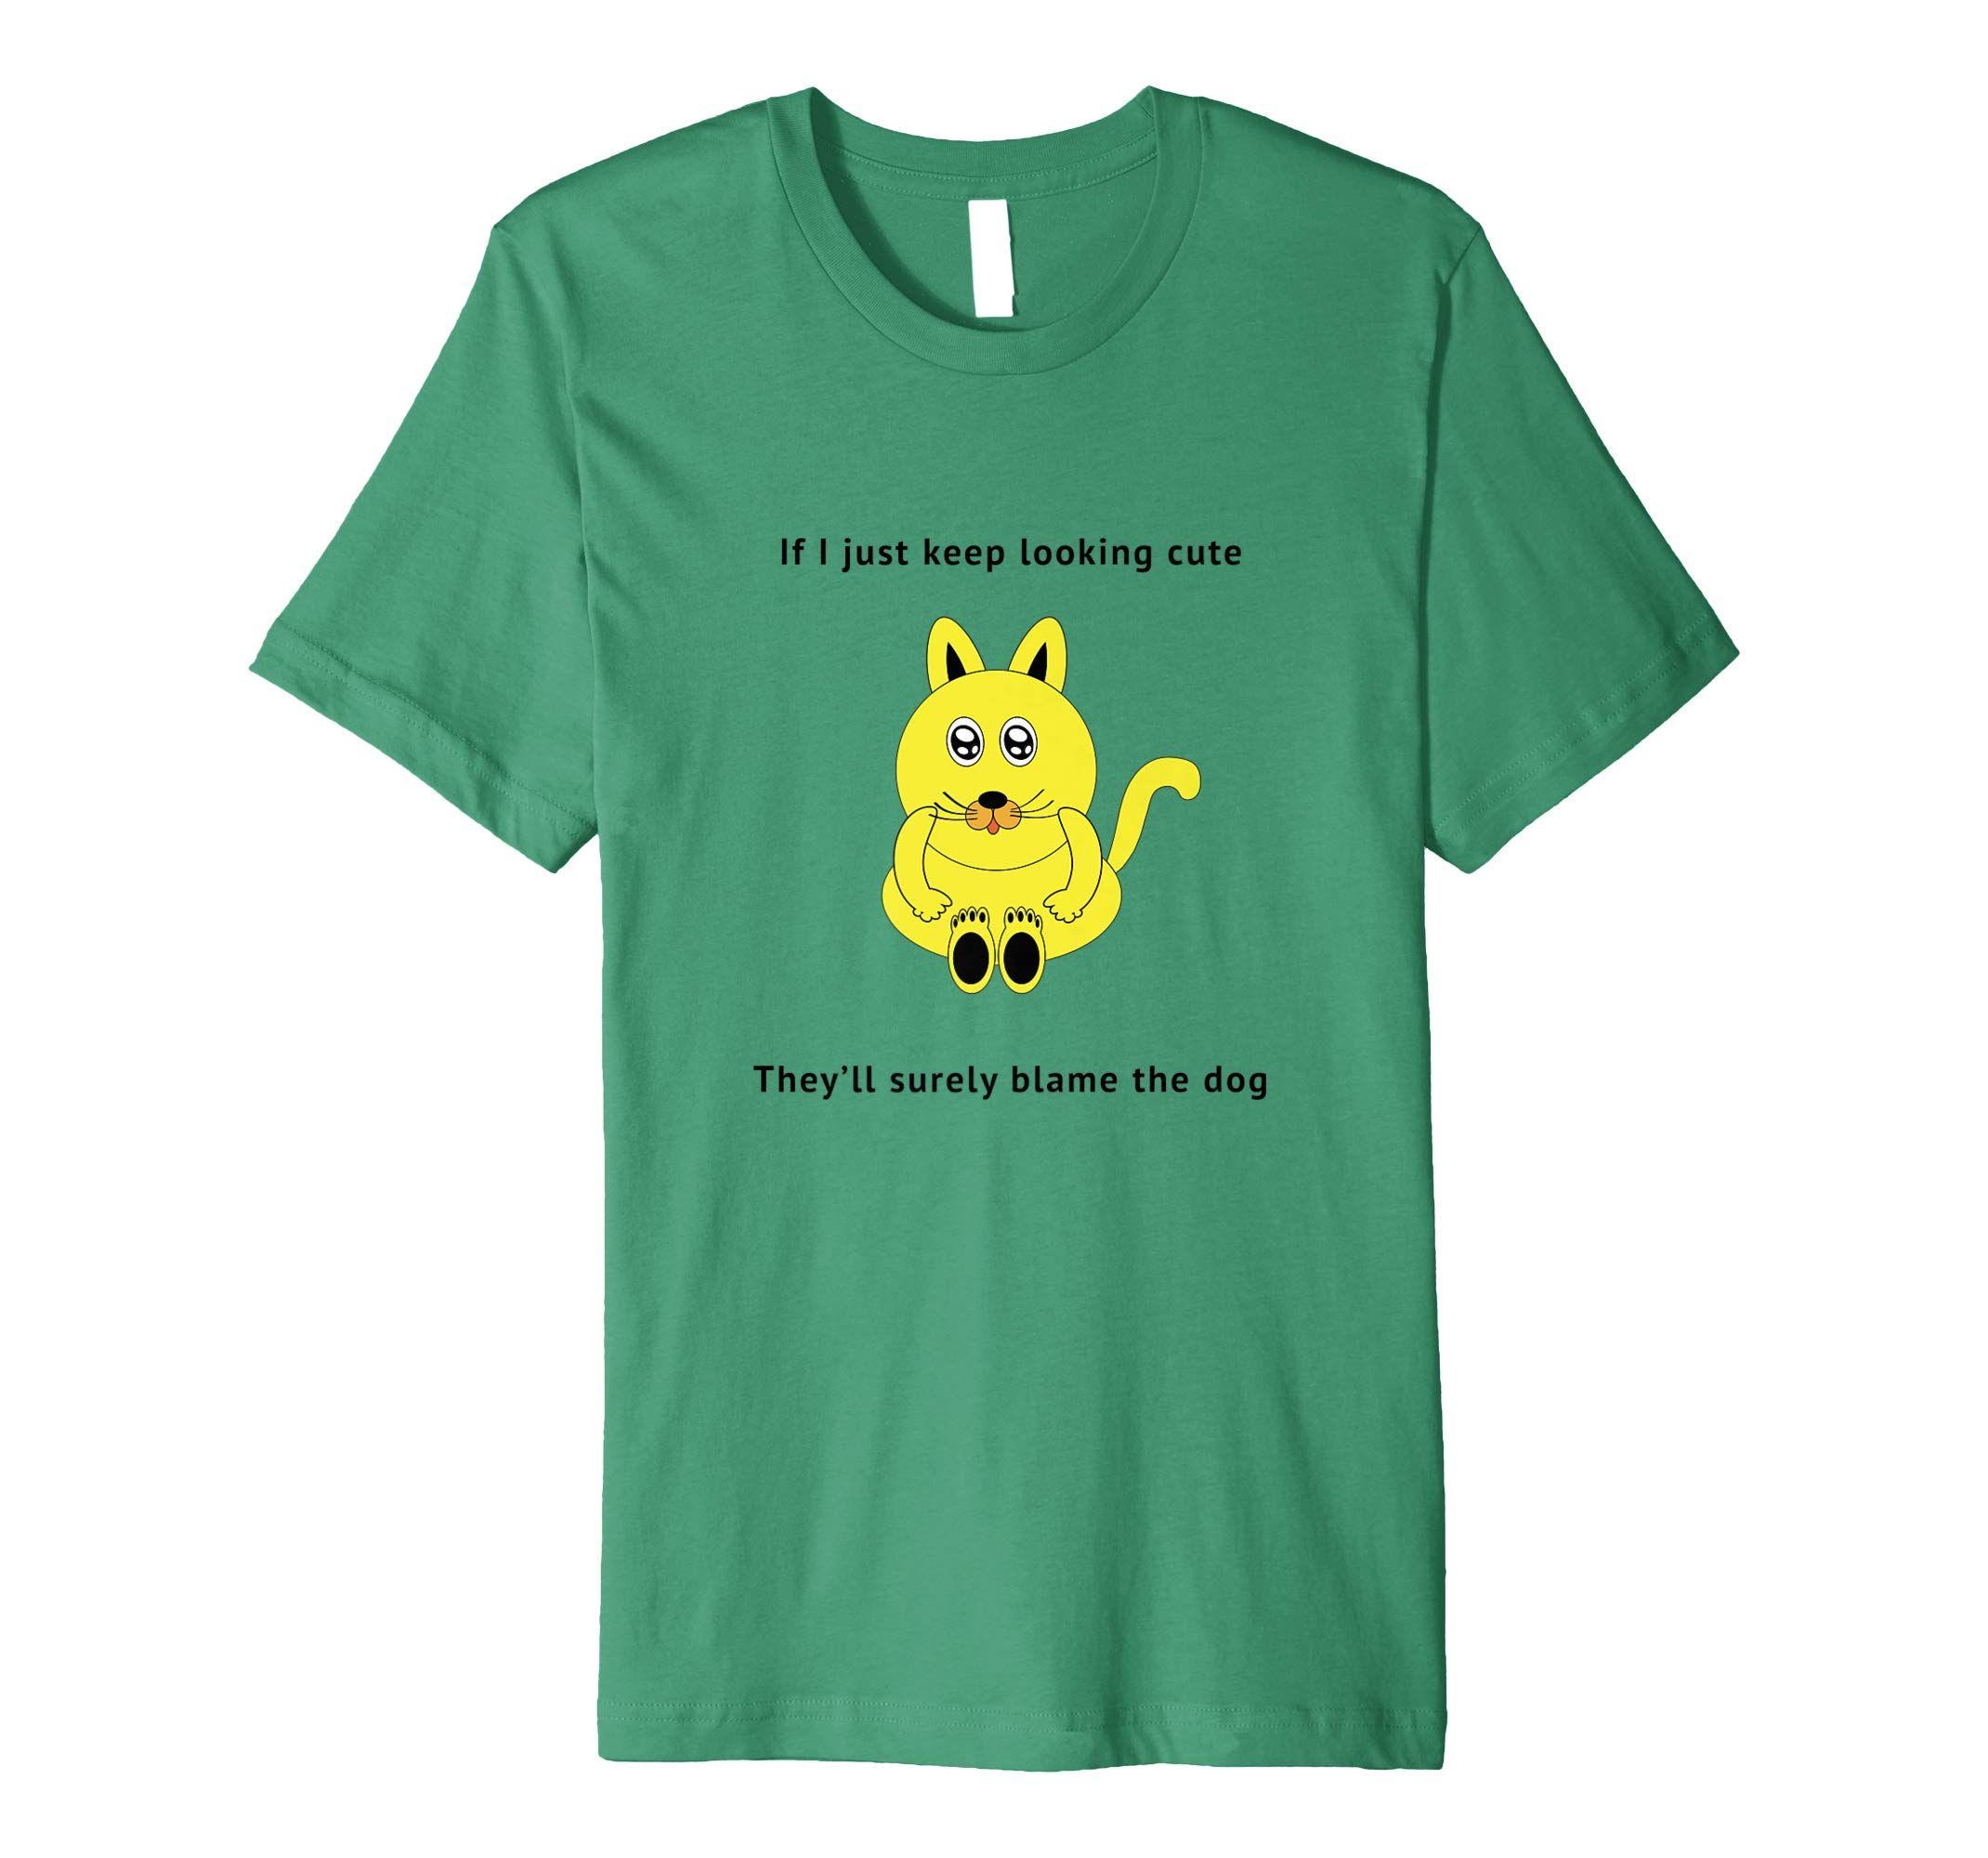 becfa0cd2 Cute yellow cartoon cat with funny cat dog meme T - Shirt: Amazon.co.uk:  Clothing